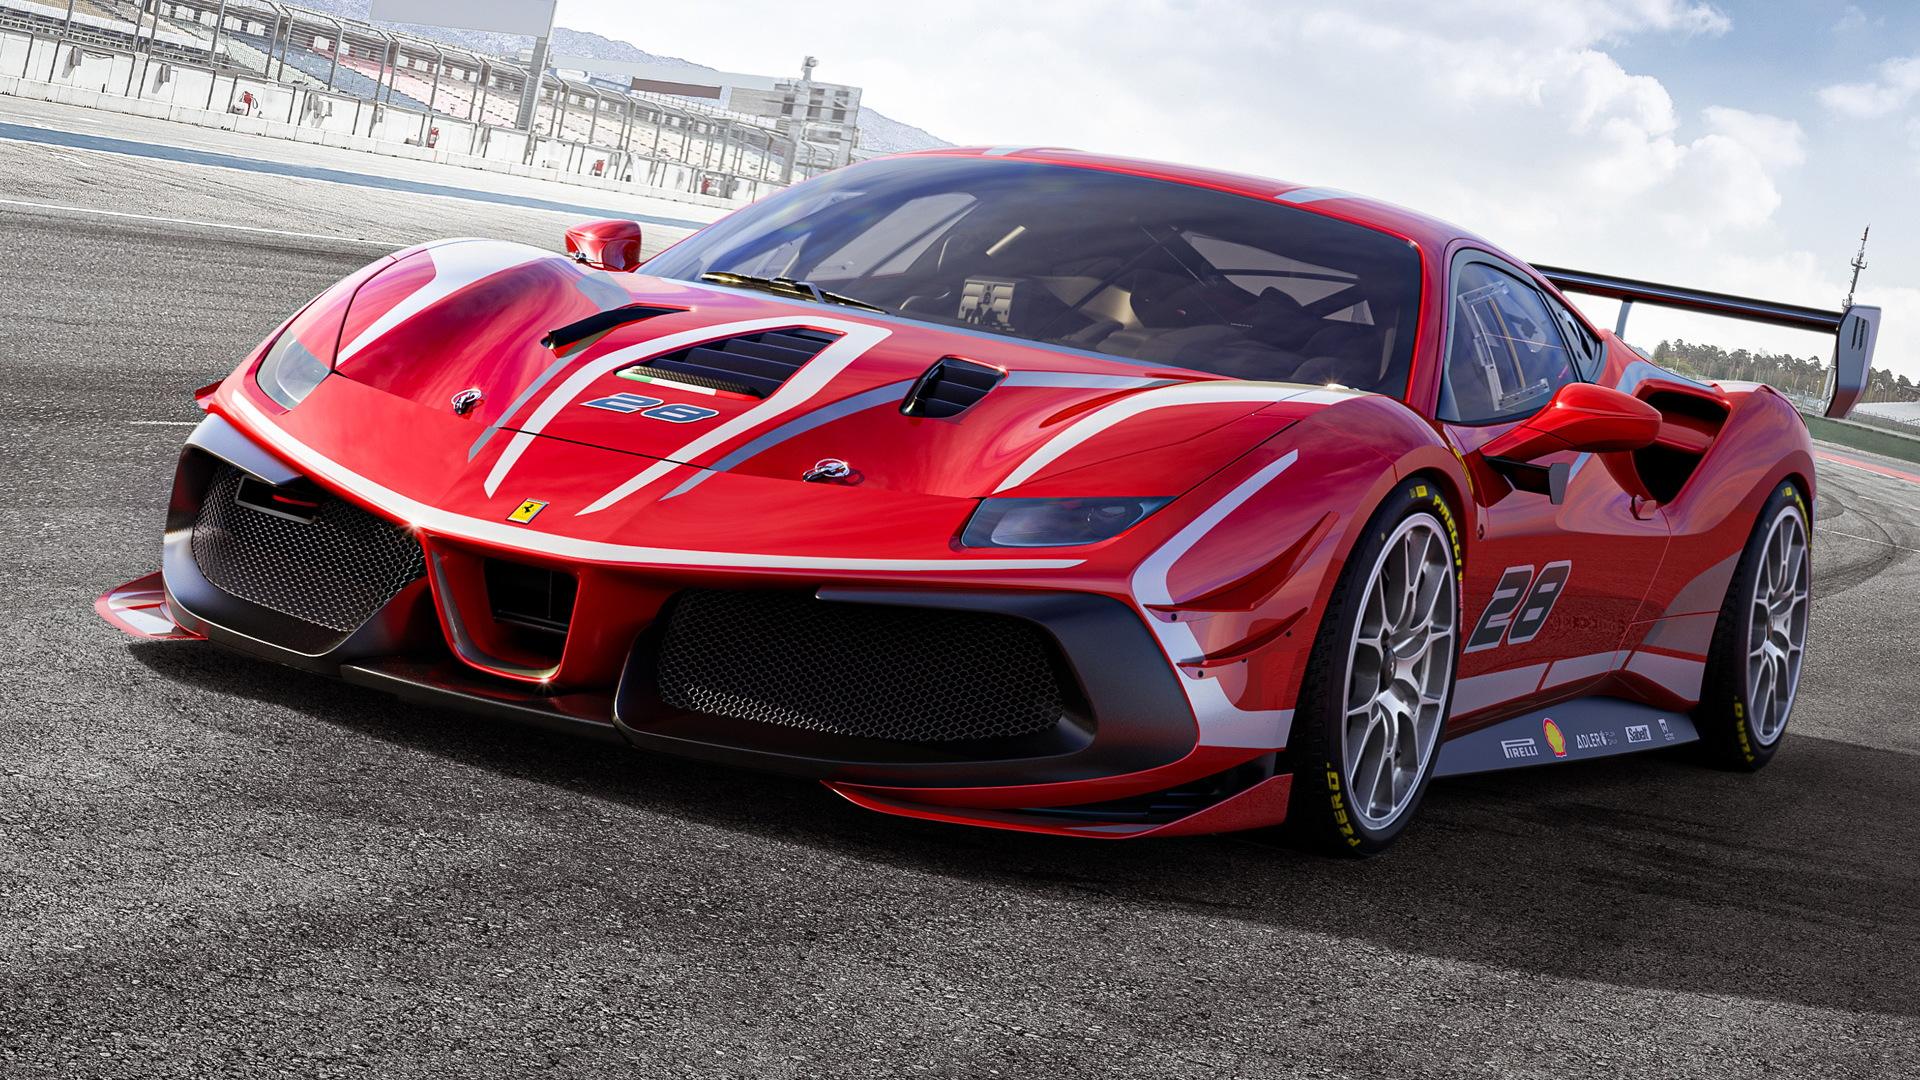 2020 Ferrari 488 Challenge Evo race car